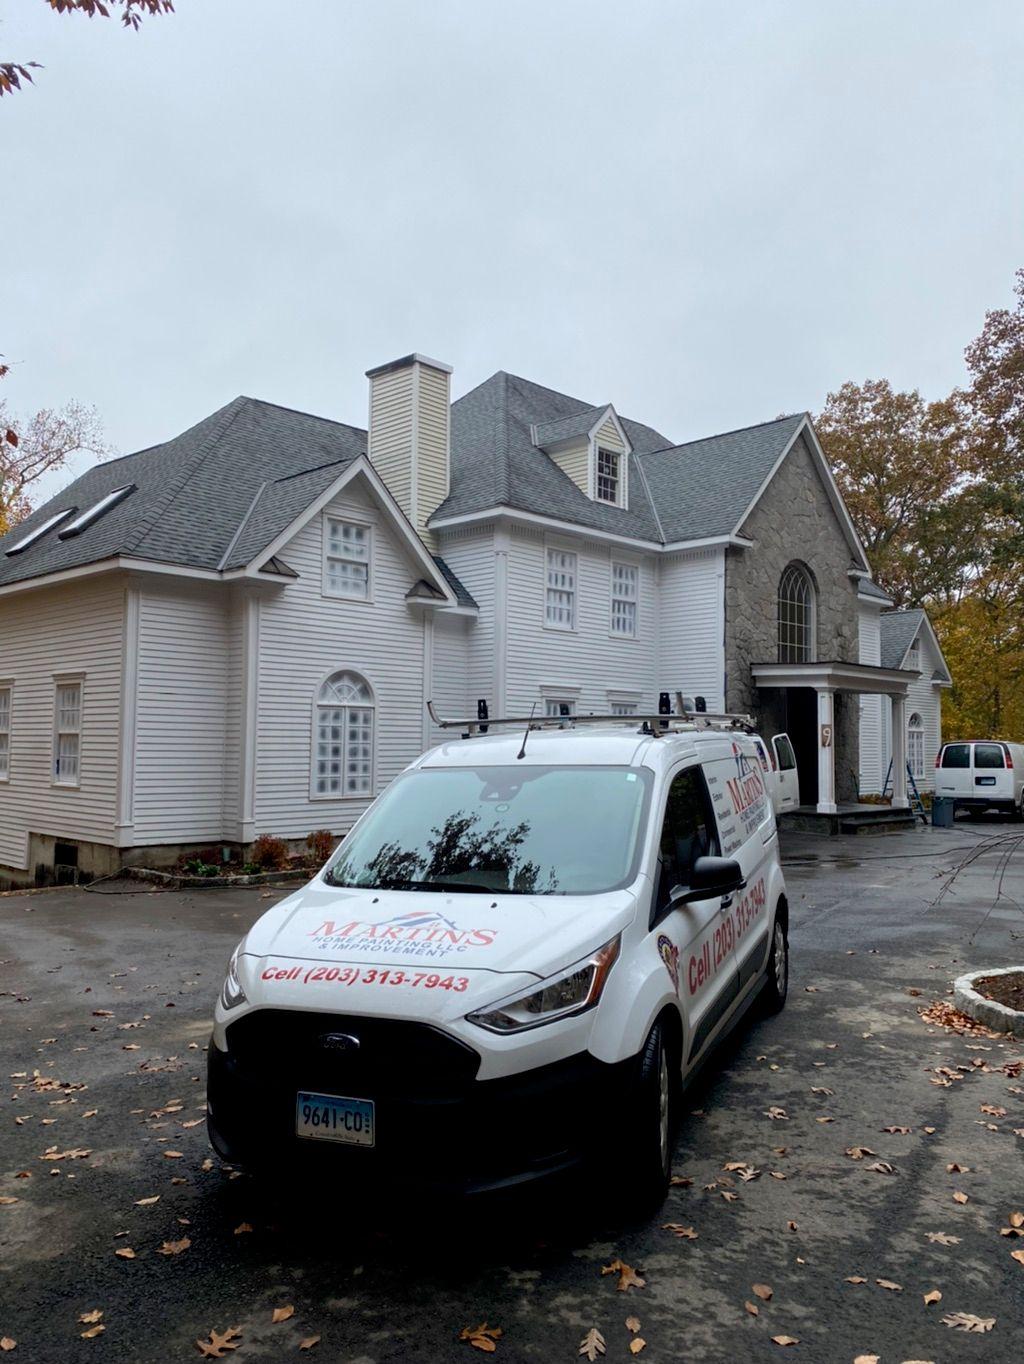 Martins Home Painting LLC